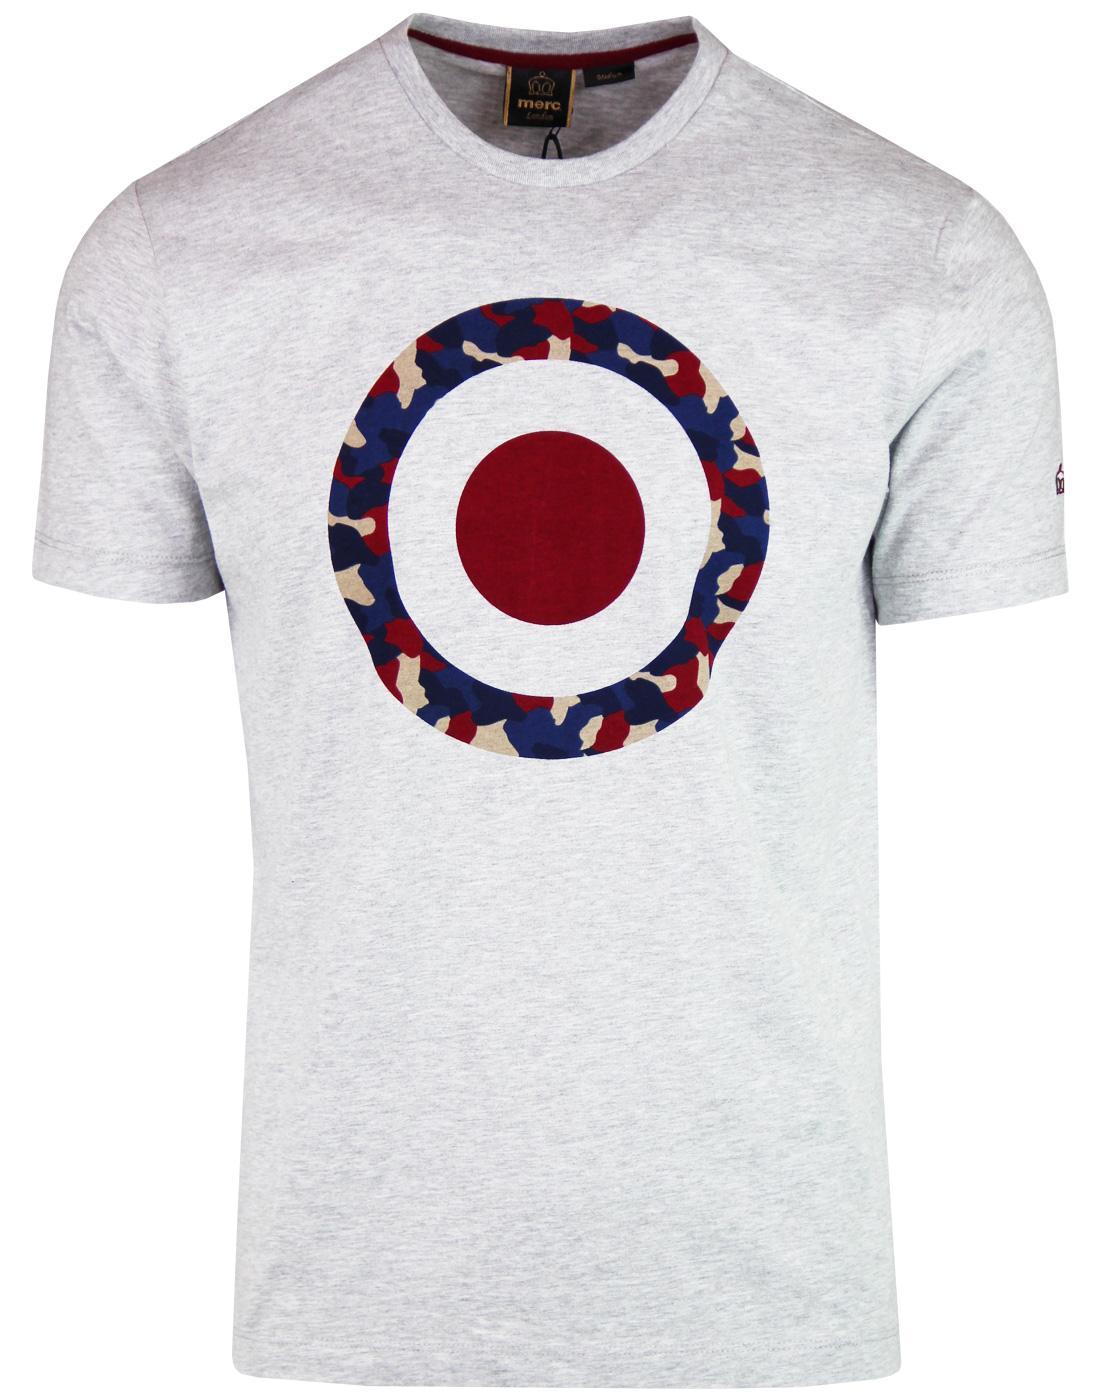 Tario Camo MERC Men's Retro Mod Target T-Shirt